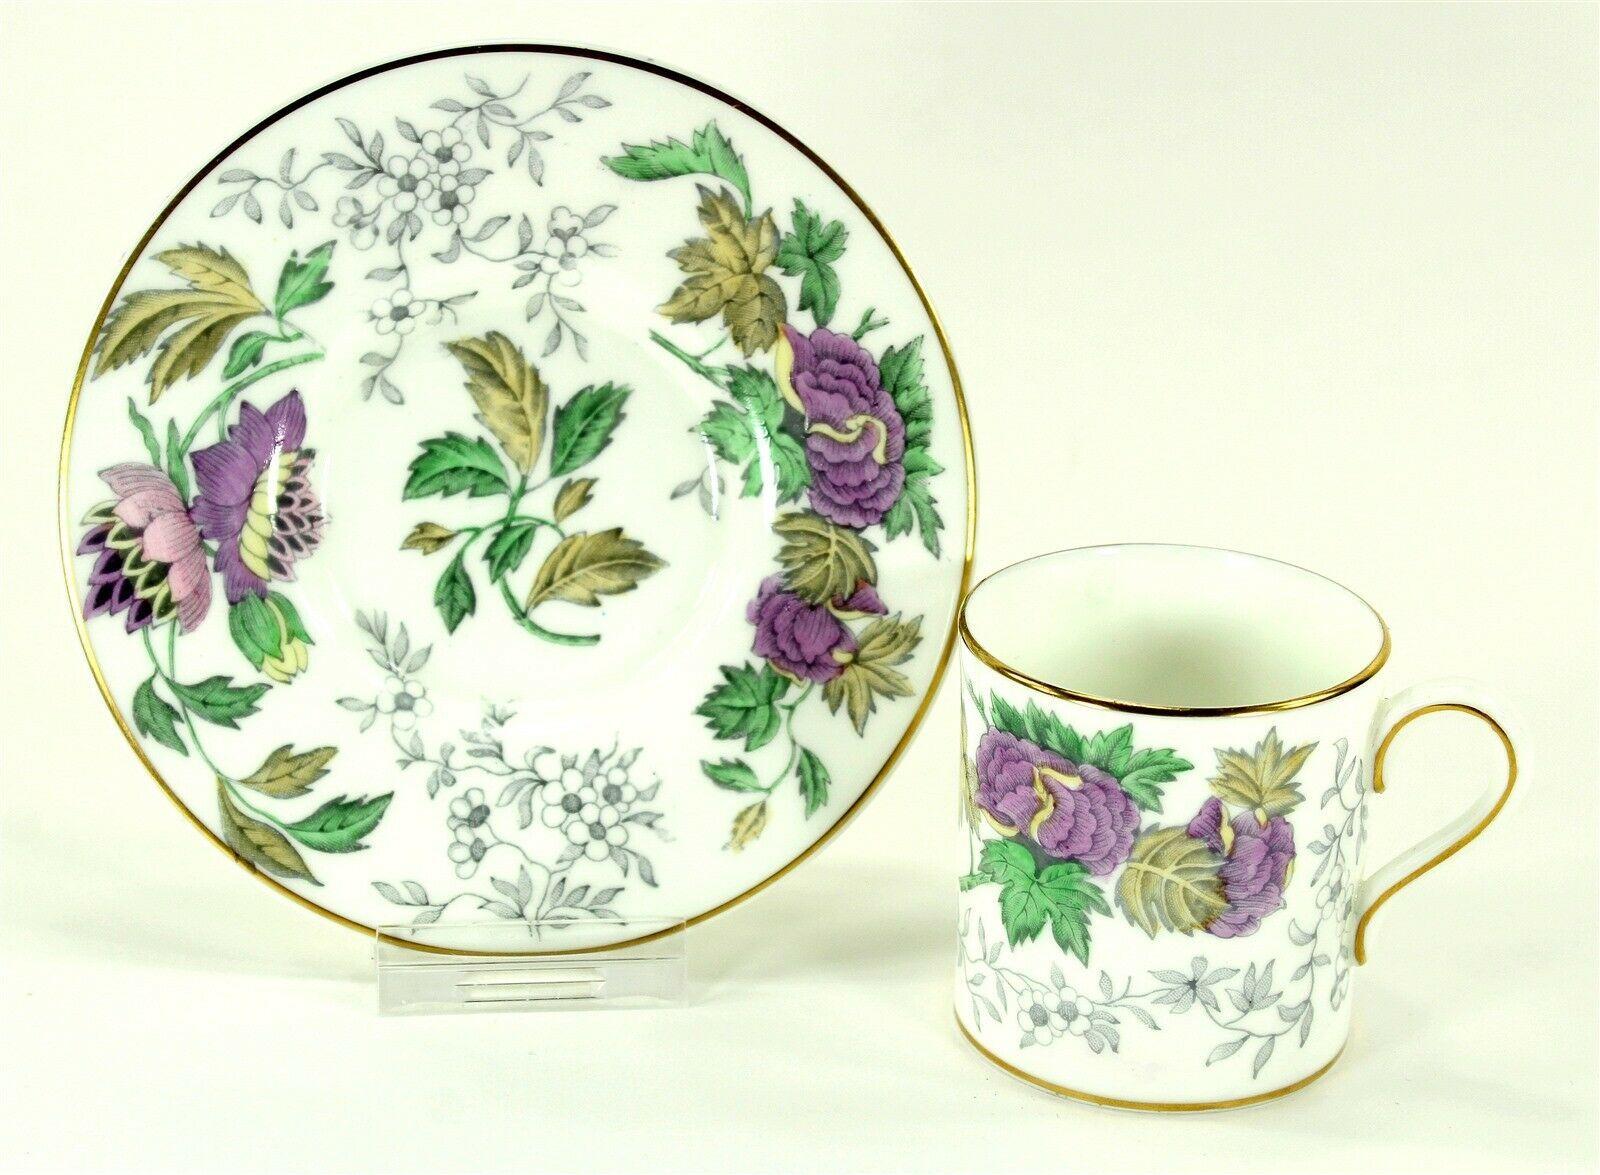 Wedgwood Avon 3983 Flat Demitasse Cup and Saucer, Bone China Lavender Floral